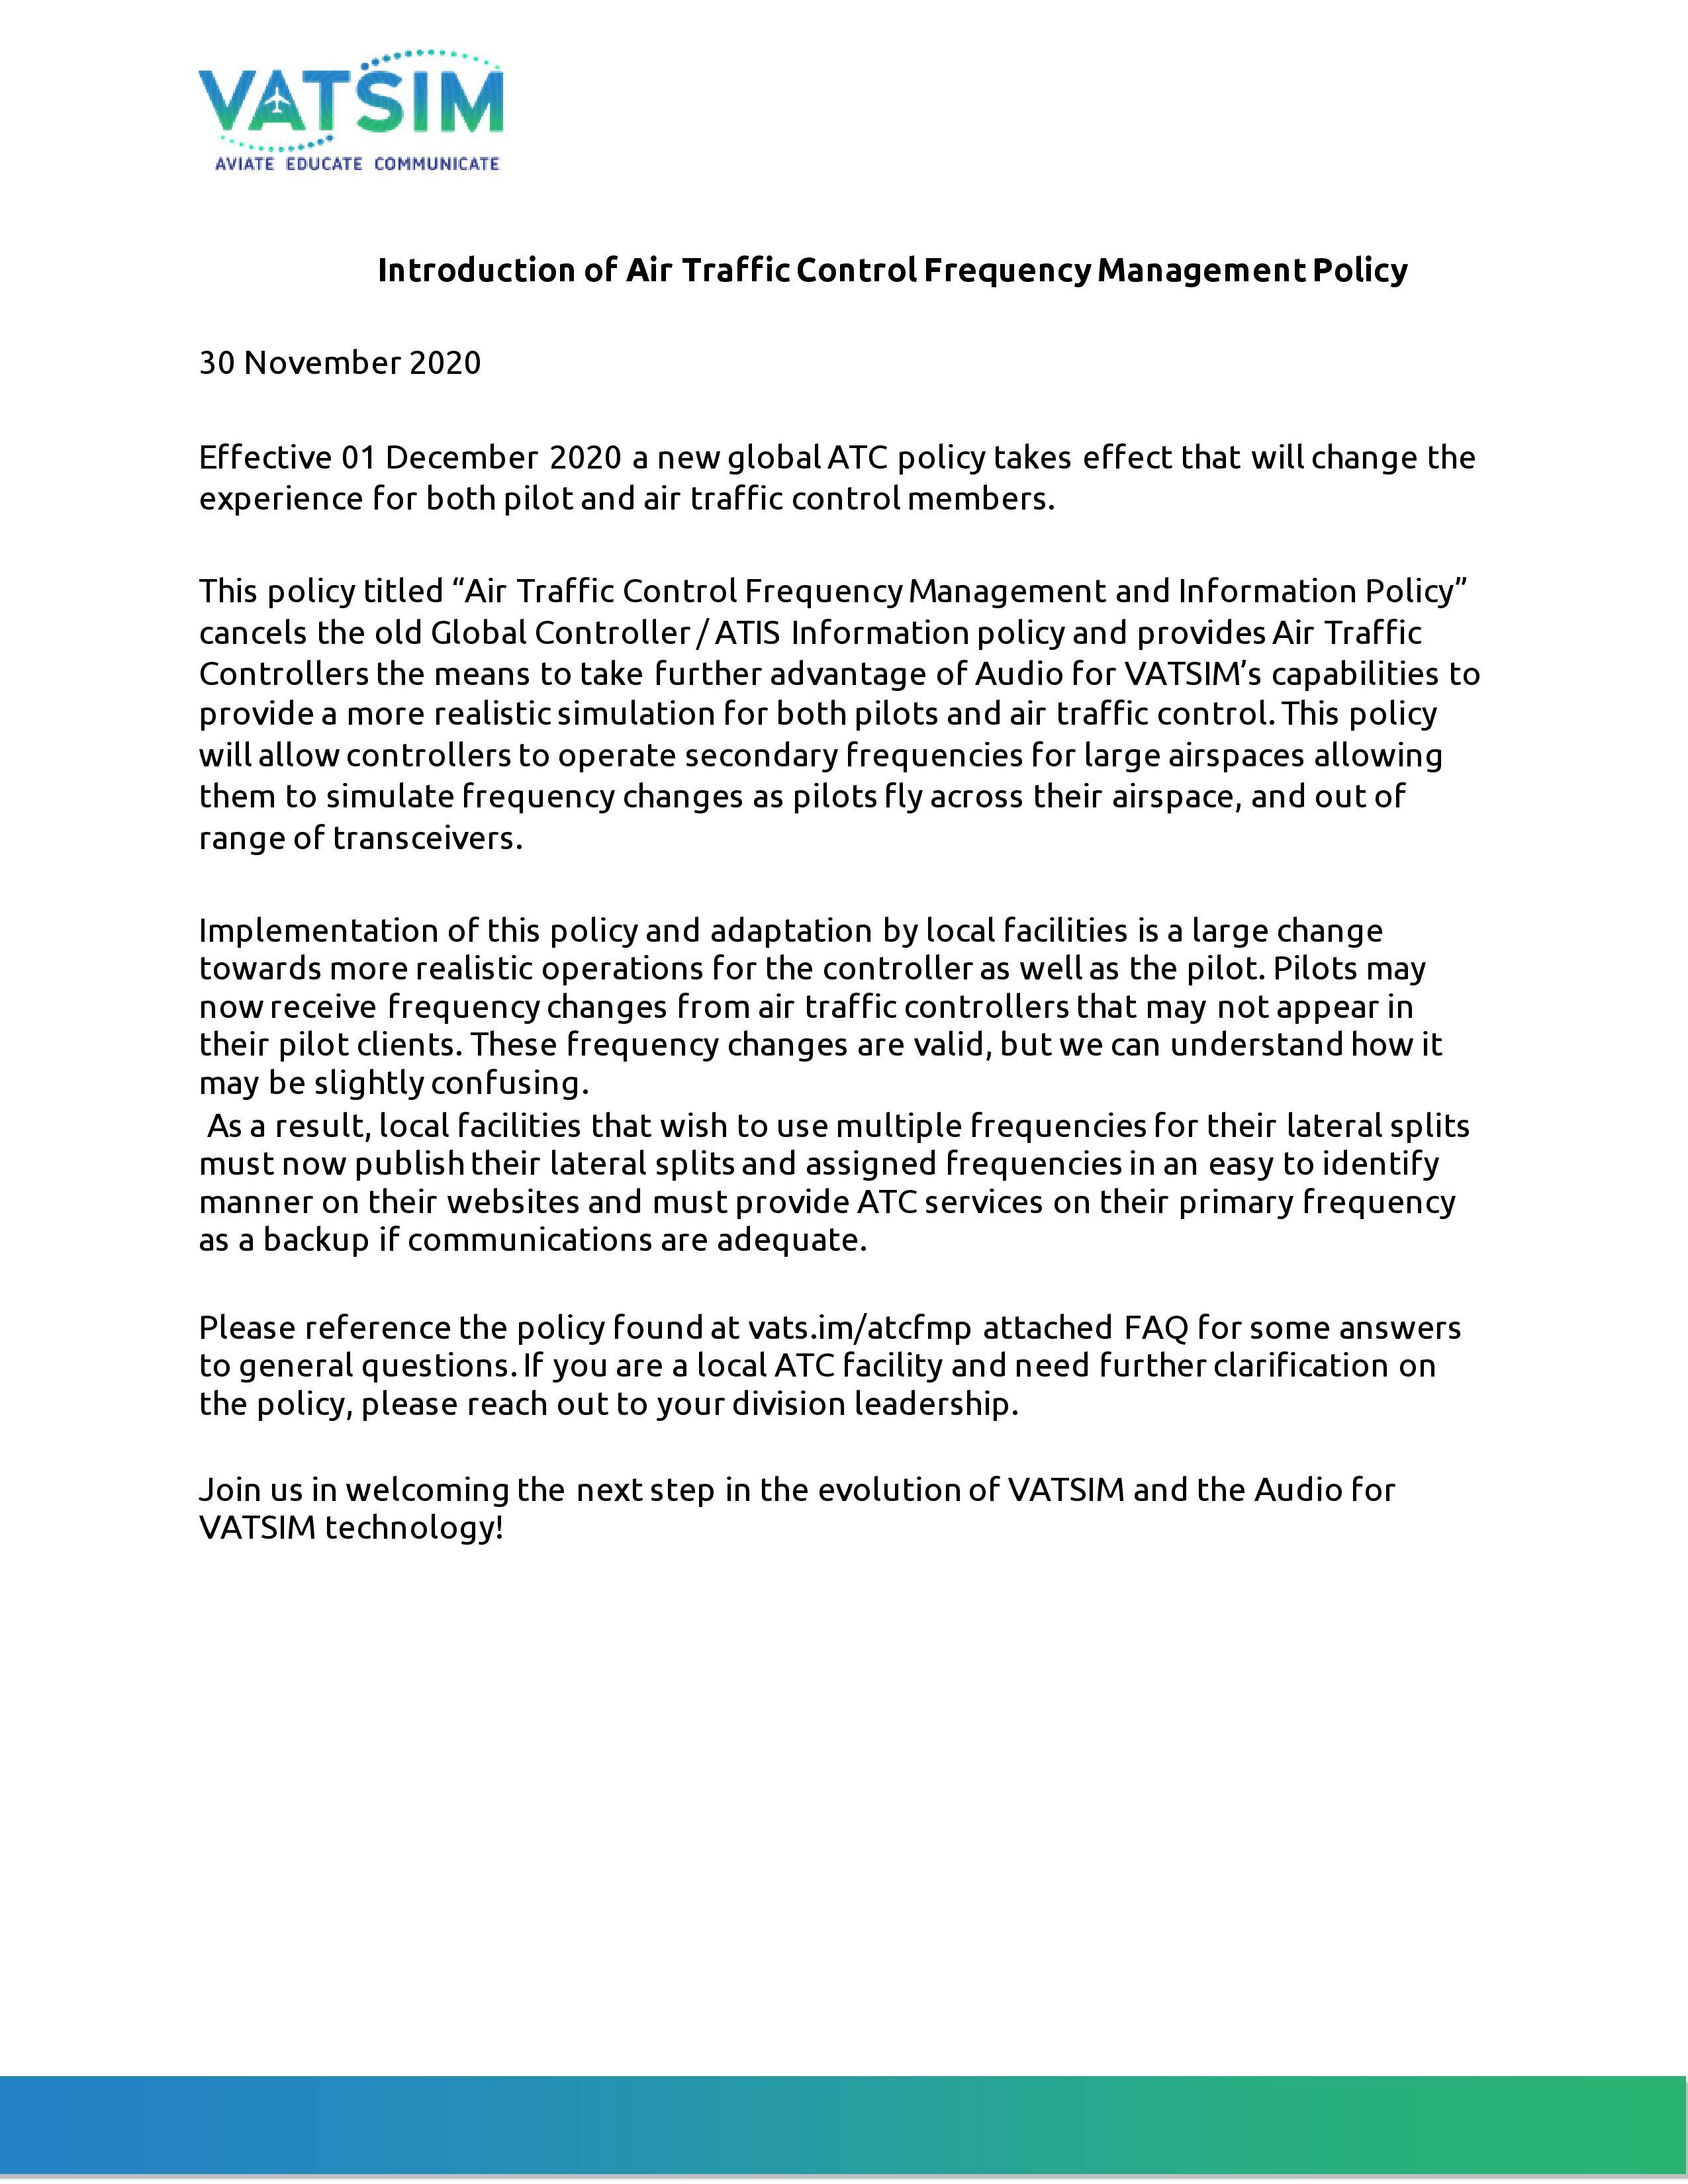 ATCFMP_Announcement-page-001.jpg